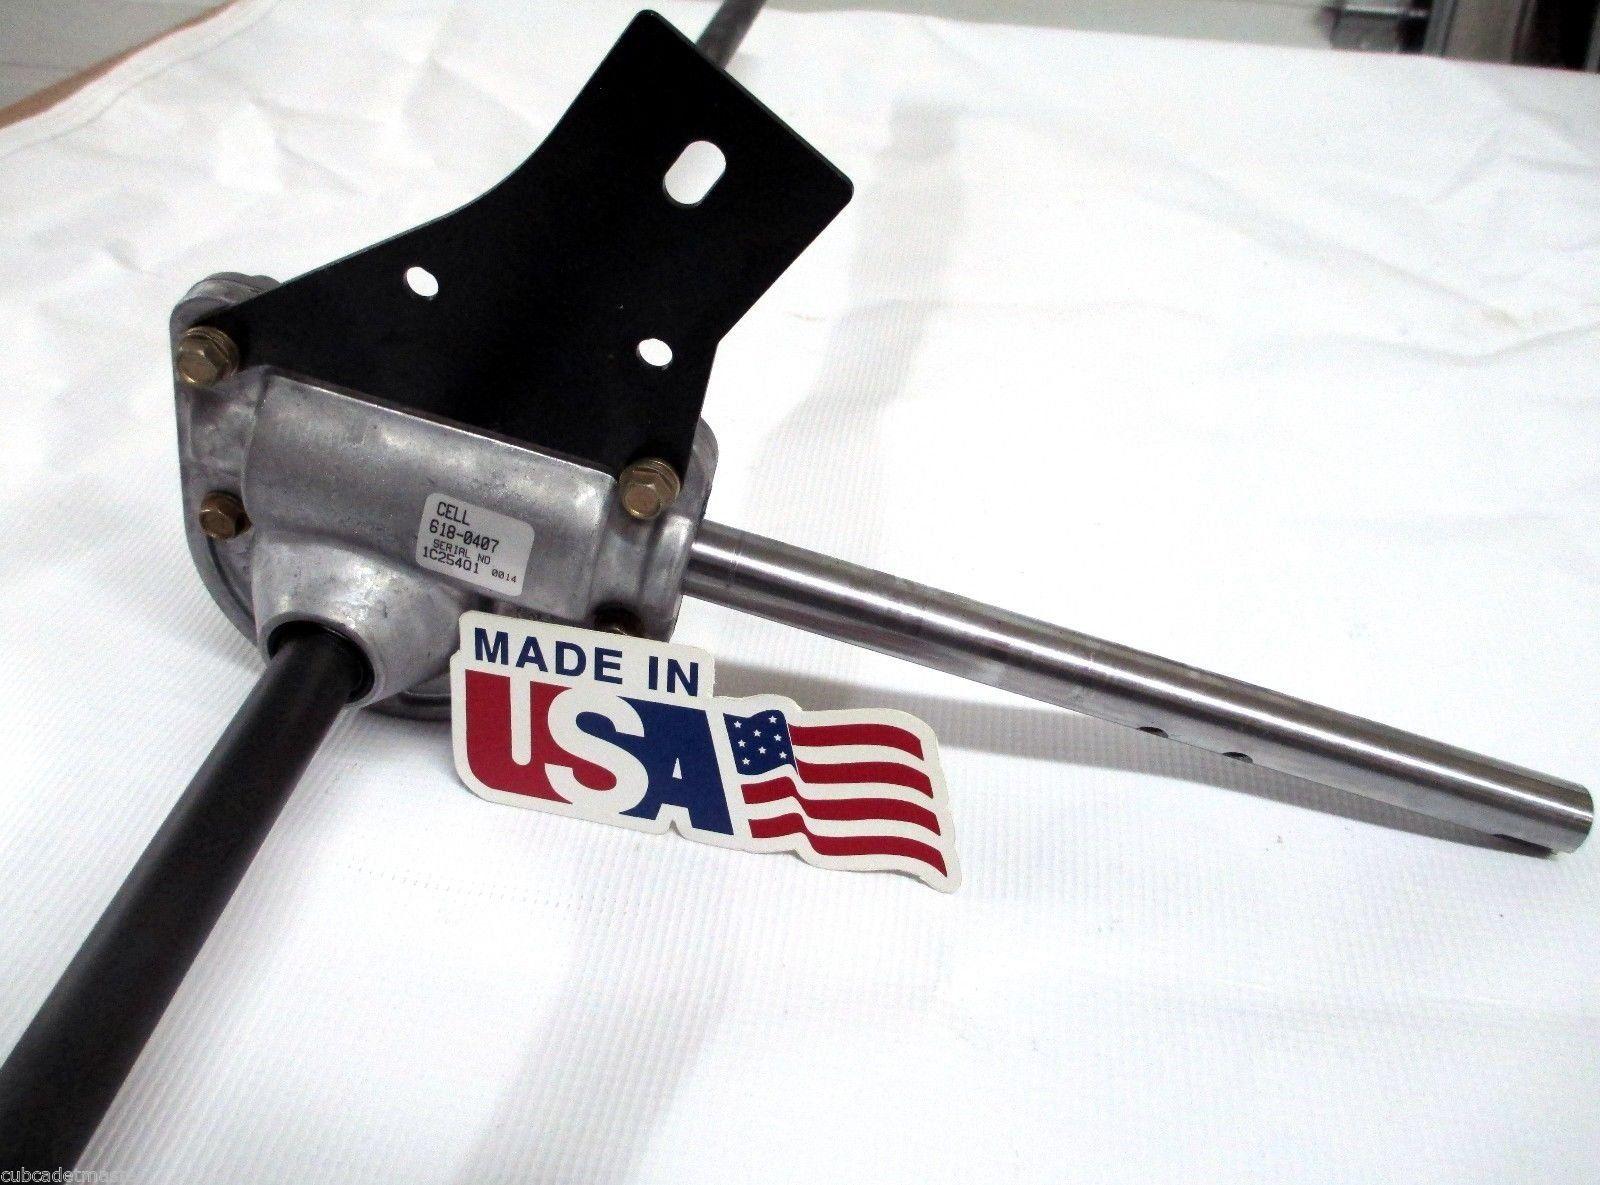 Mtd Oem 618 0407 918 Craftsman Huskee Snow Blower 42 Auger Wiring Diagram Gear